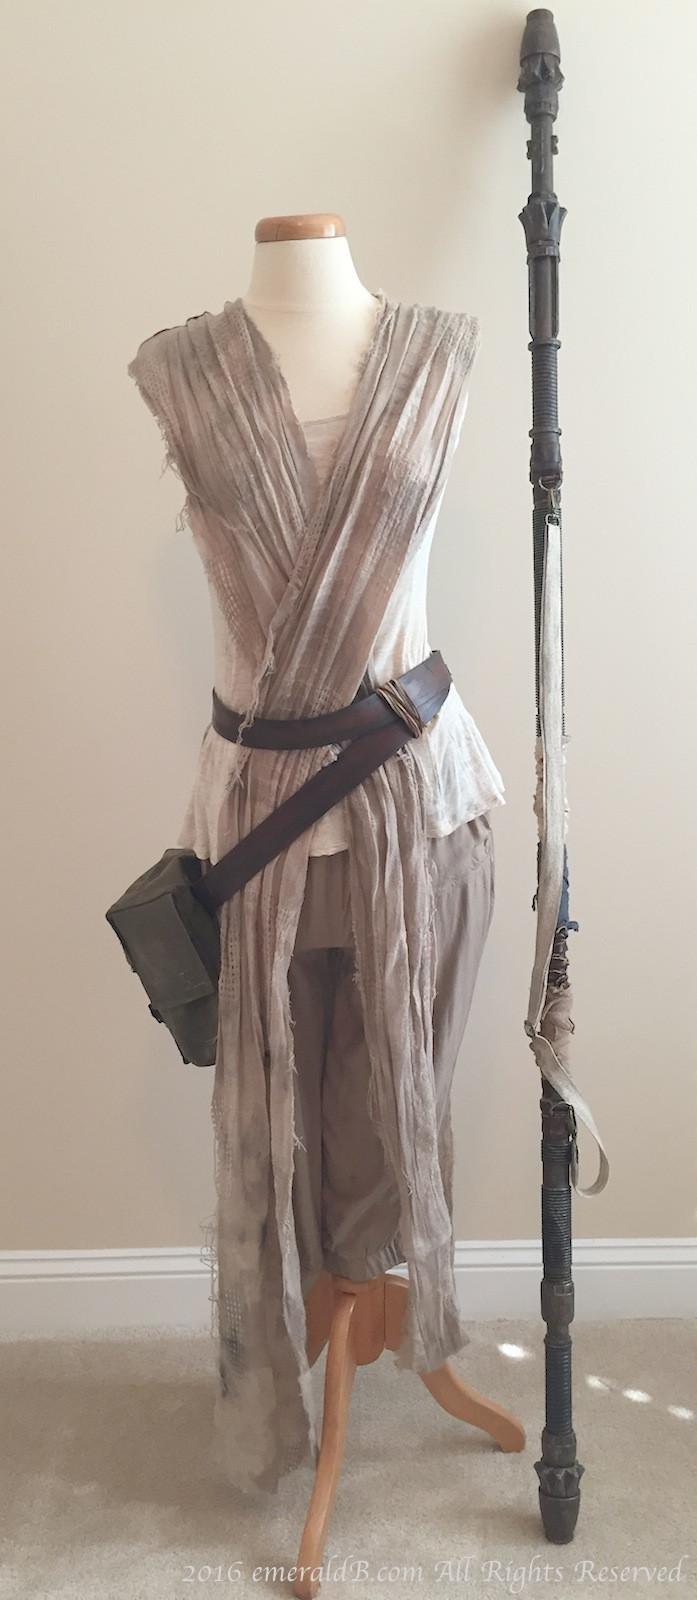 DIY Rey Costume  Star Wars Rey Costume Part 1 – Wrap Dress – emeraldB